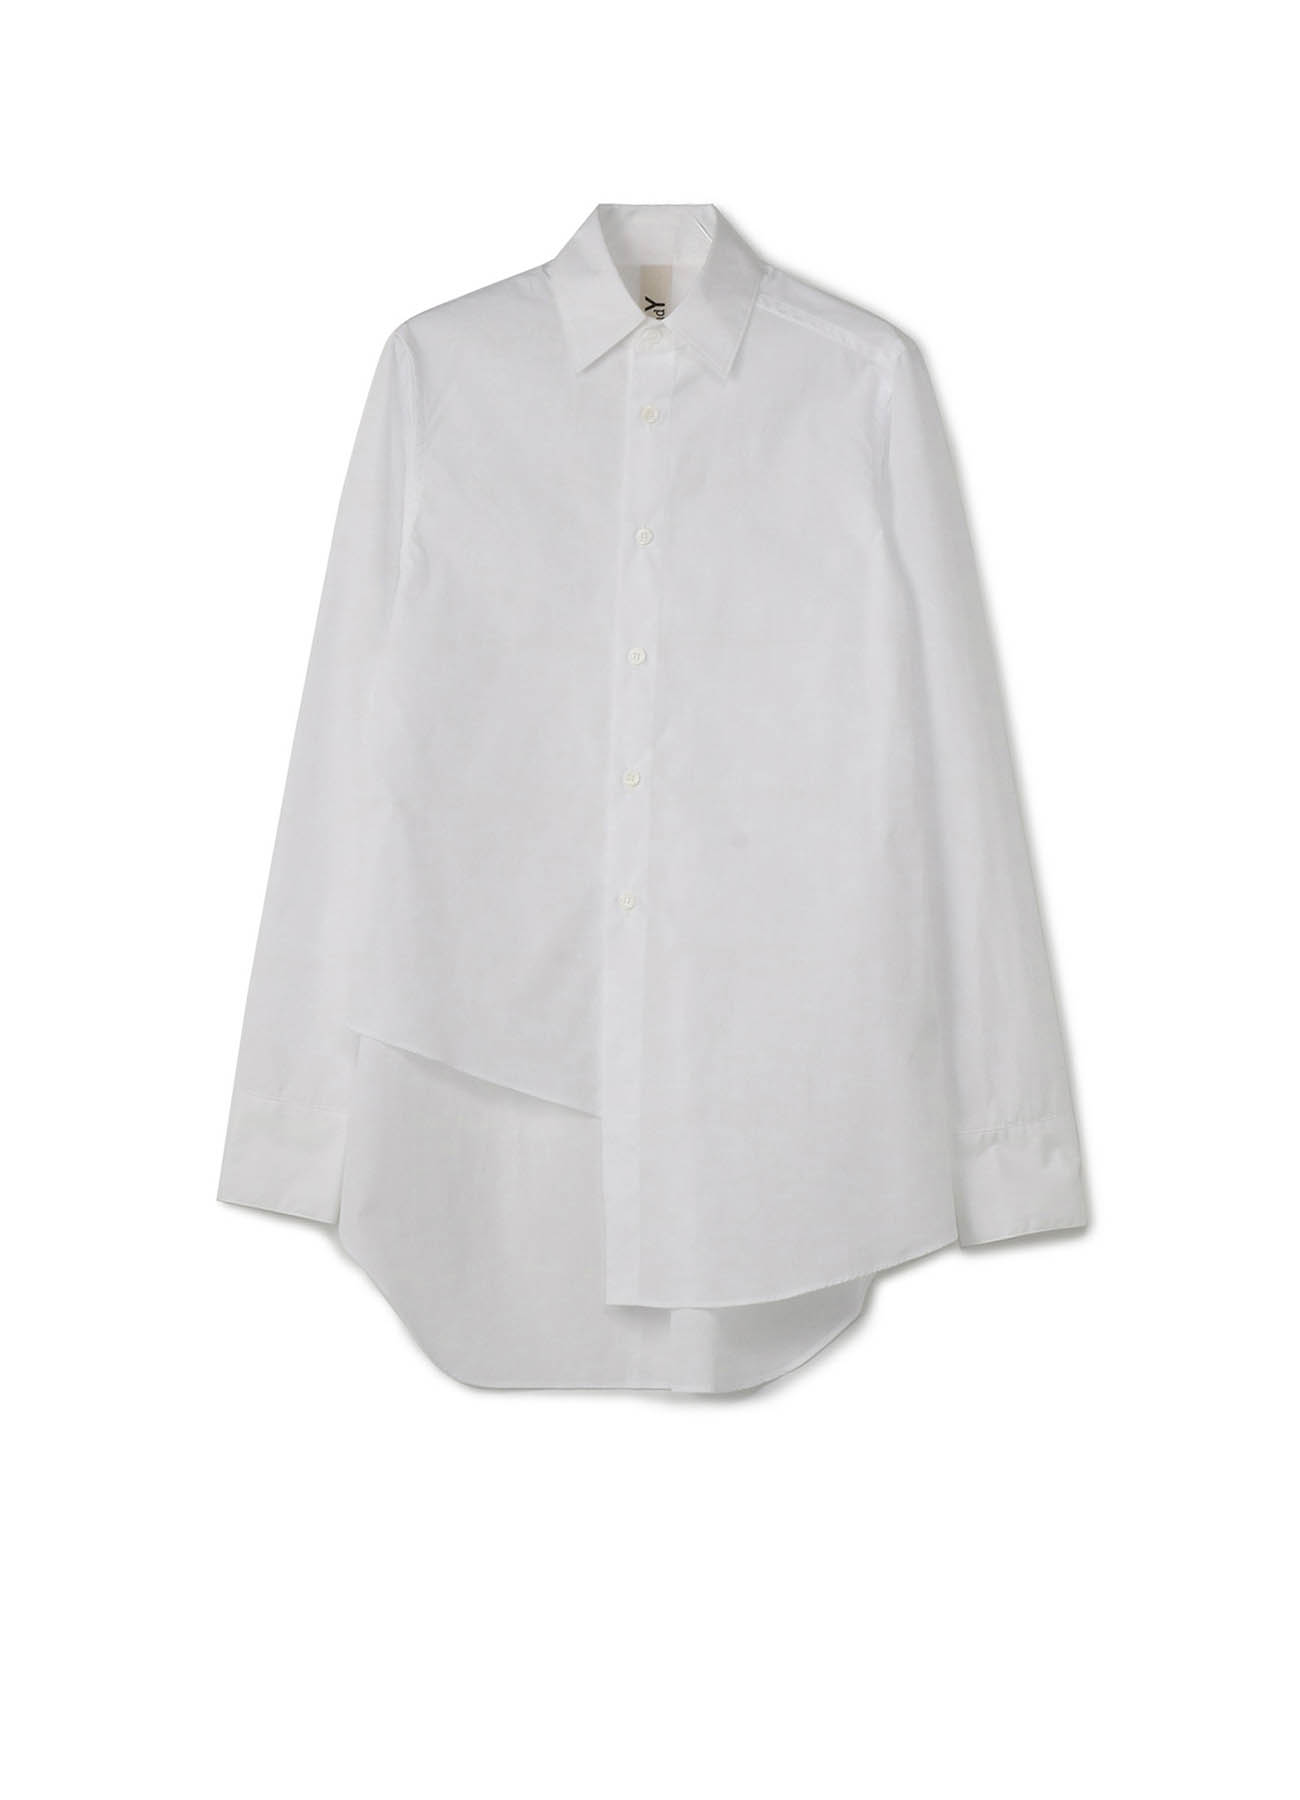 C / 棉府绸 不对称衬衫